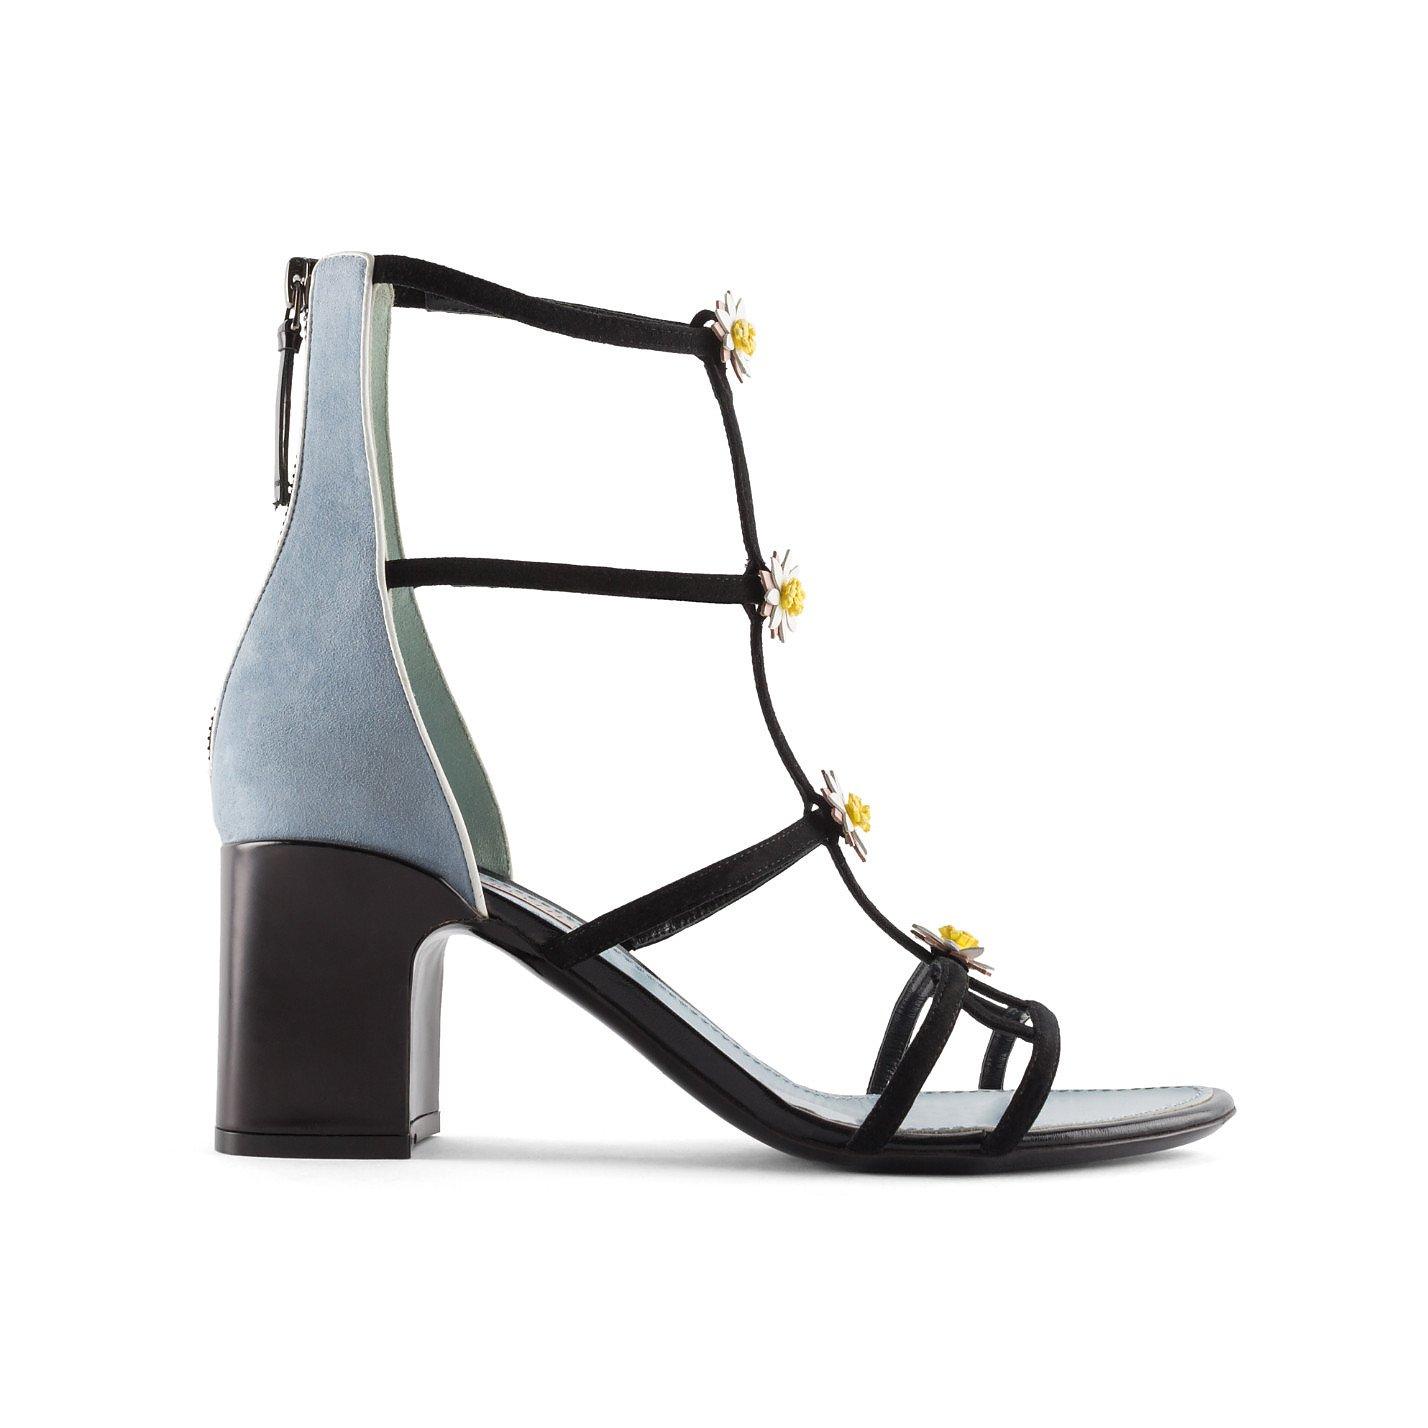 Fabrizio Viti Daisy Heeled Sandals